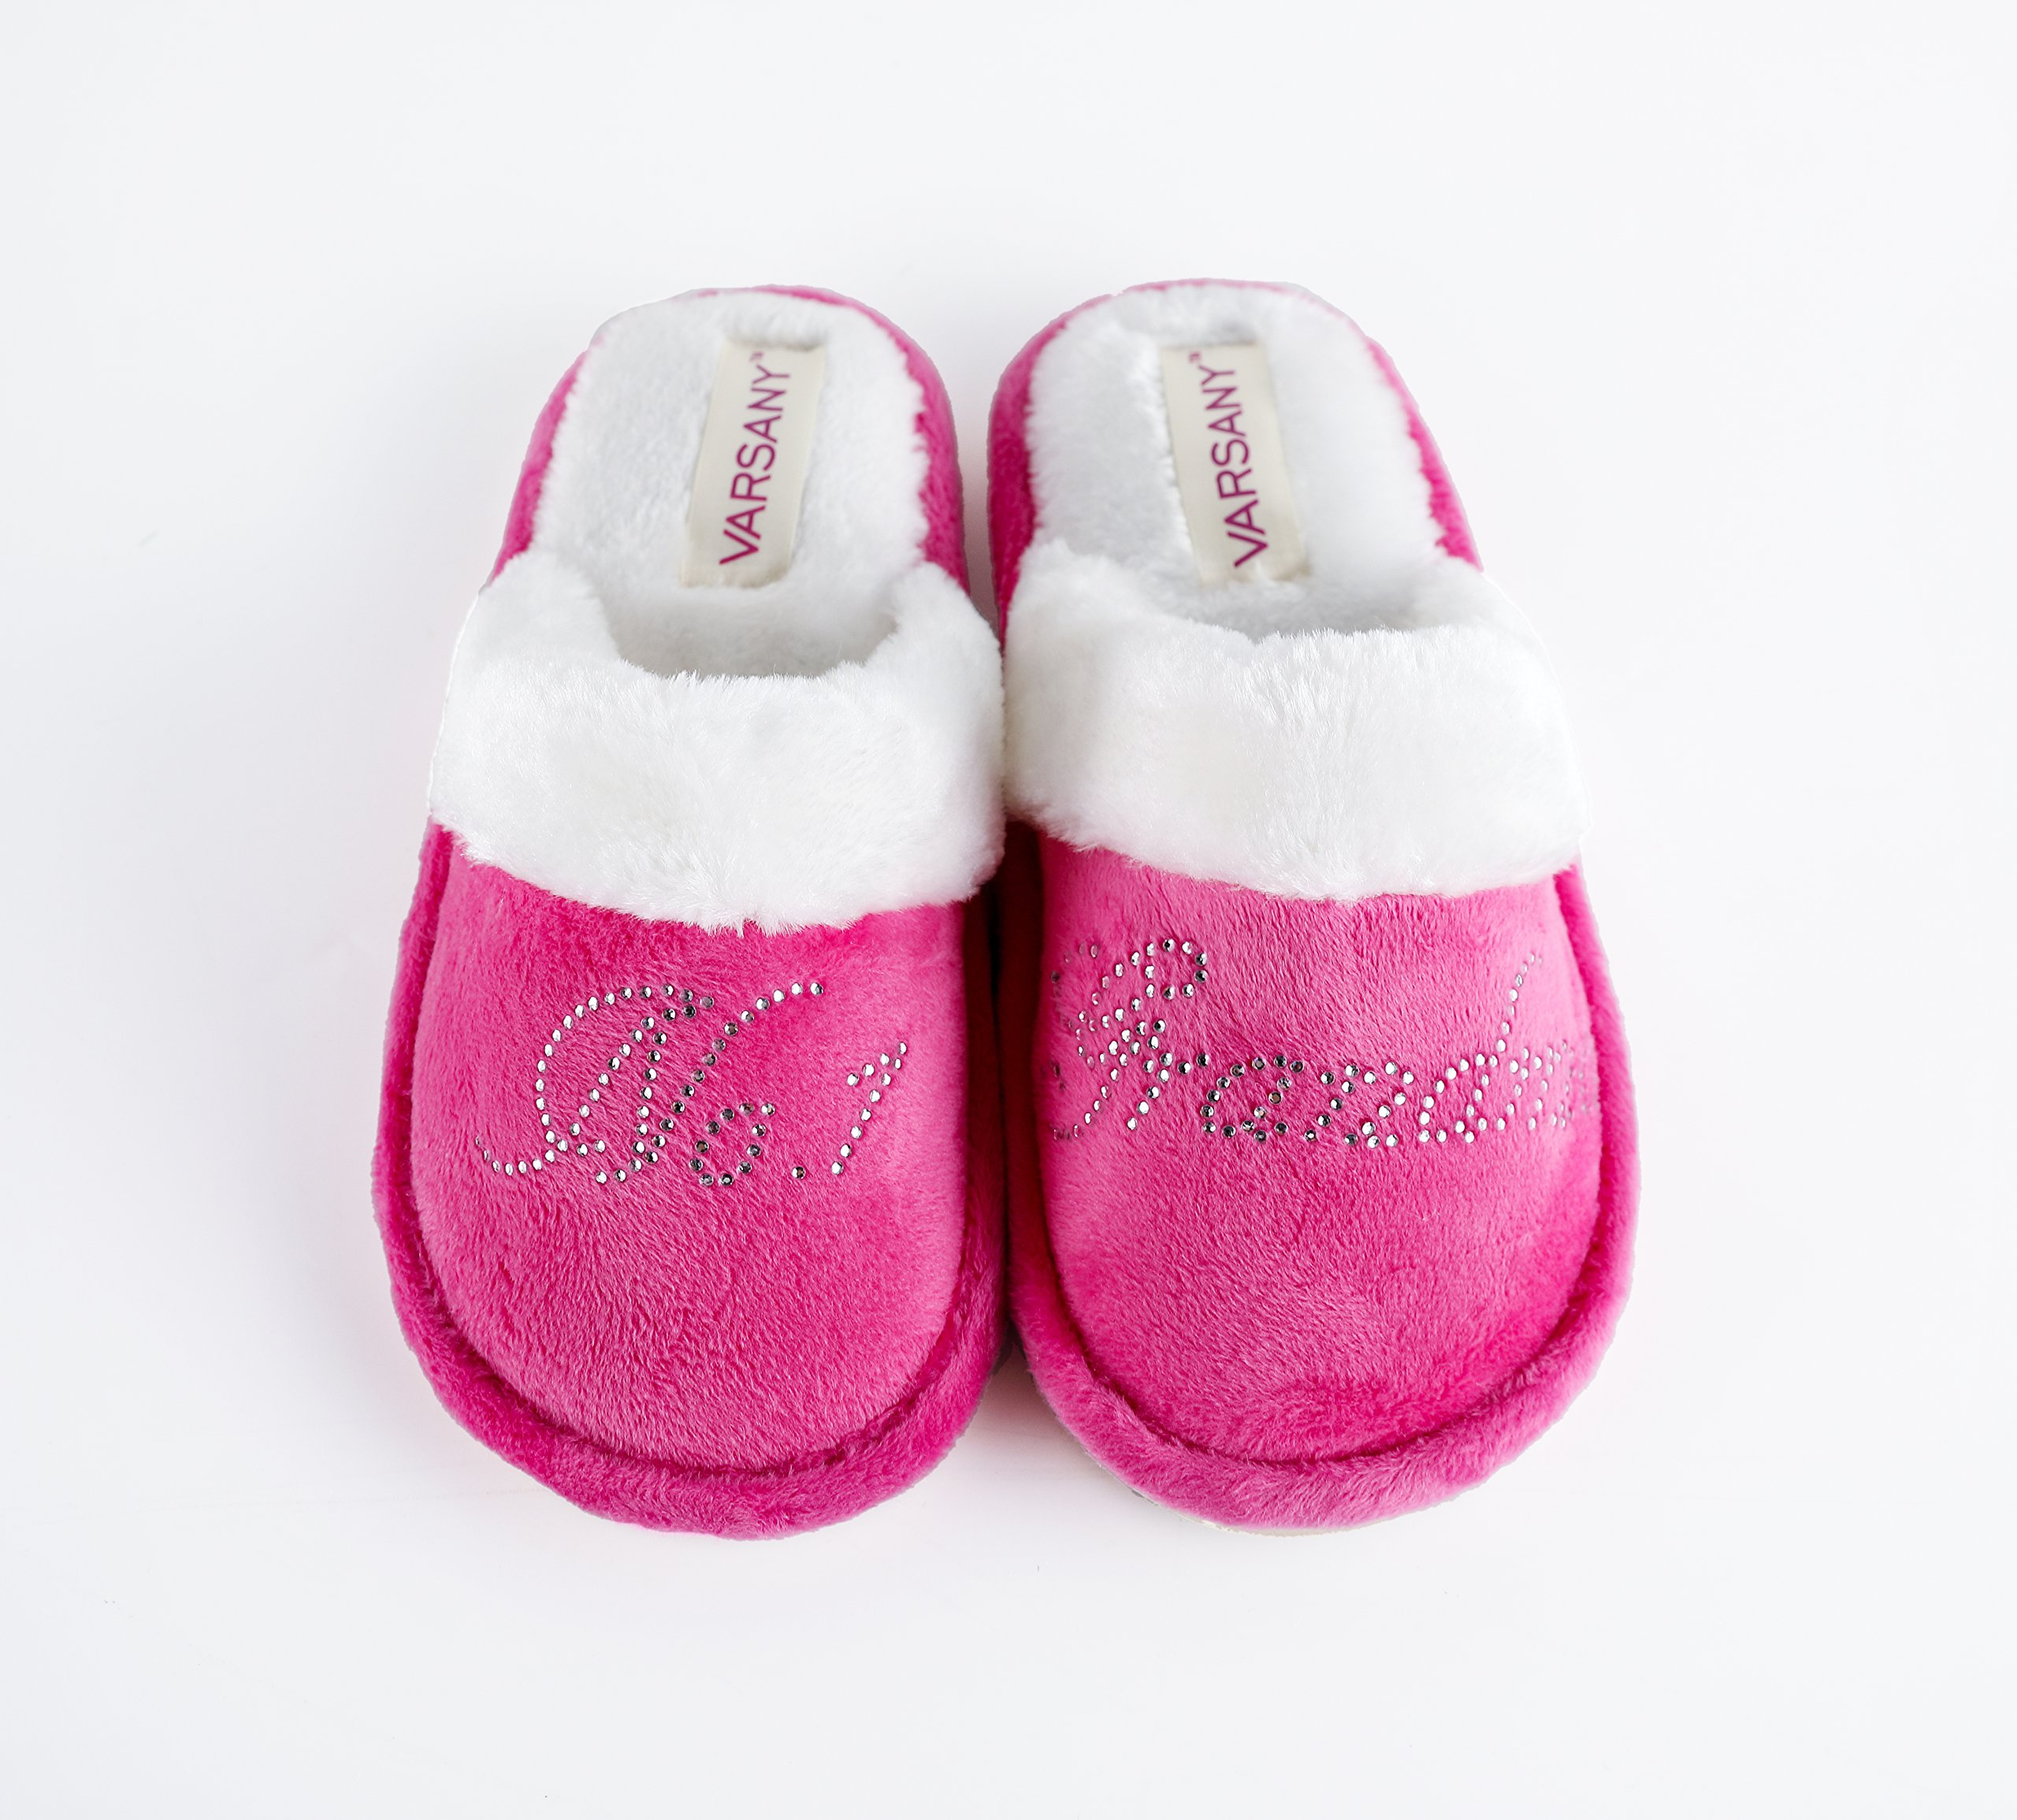 Varsany Pink Crystal No.1 Grandma Best House slippers personalised Rhinestone home slippers gift